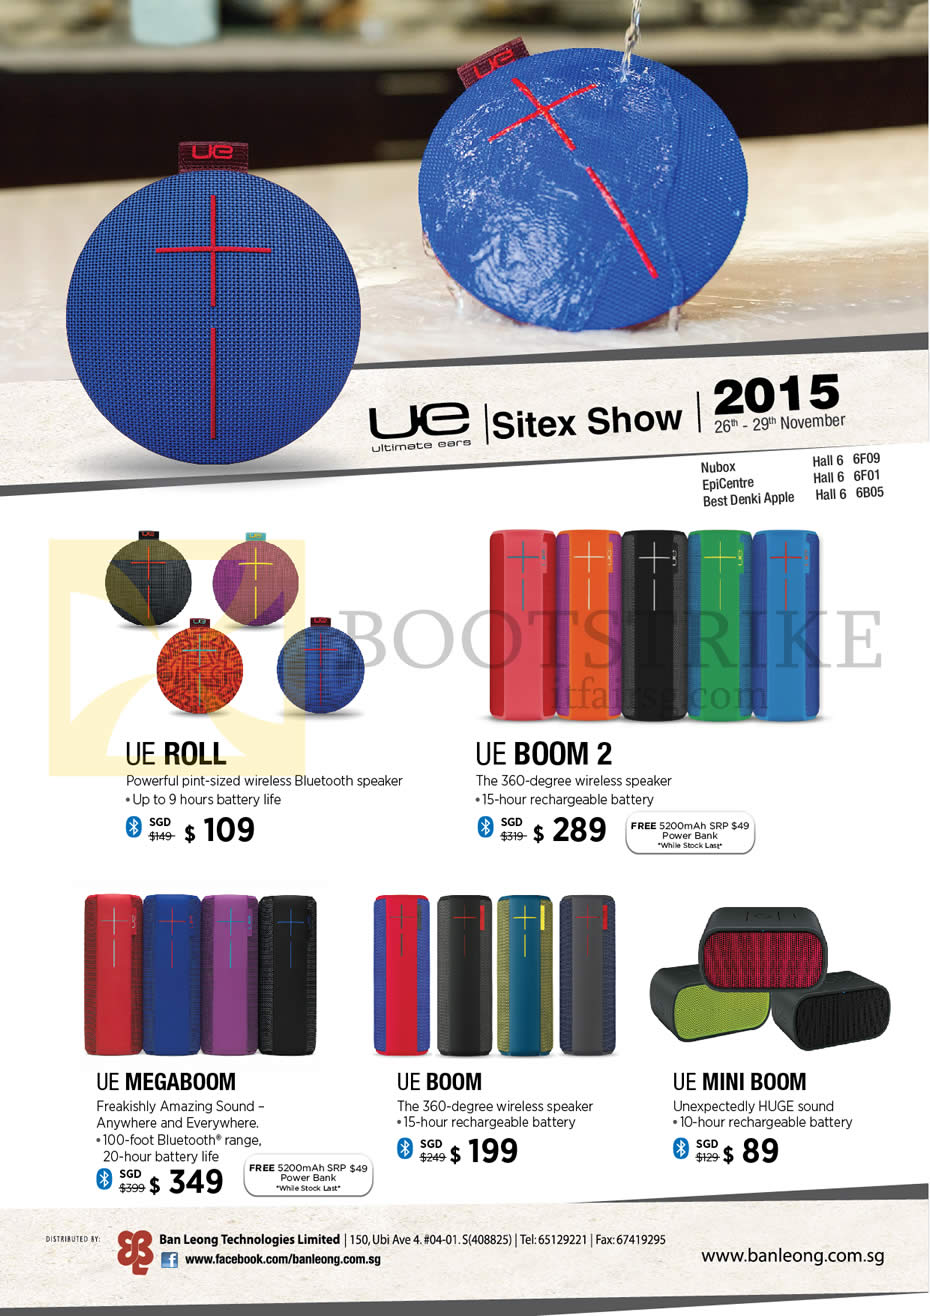 SITEX 2015 price list image brochure of Logitech Ultimate Ears Roll, Boom 2, Megaboom, Boom, Mini Boom